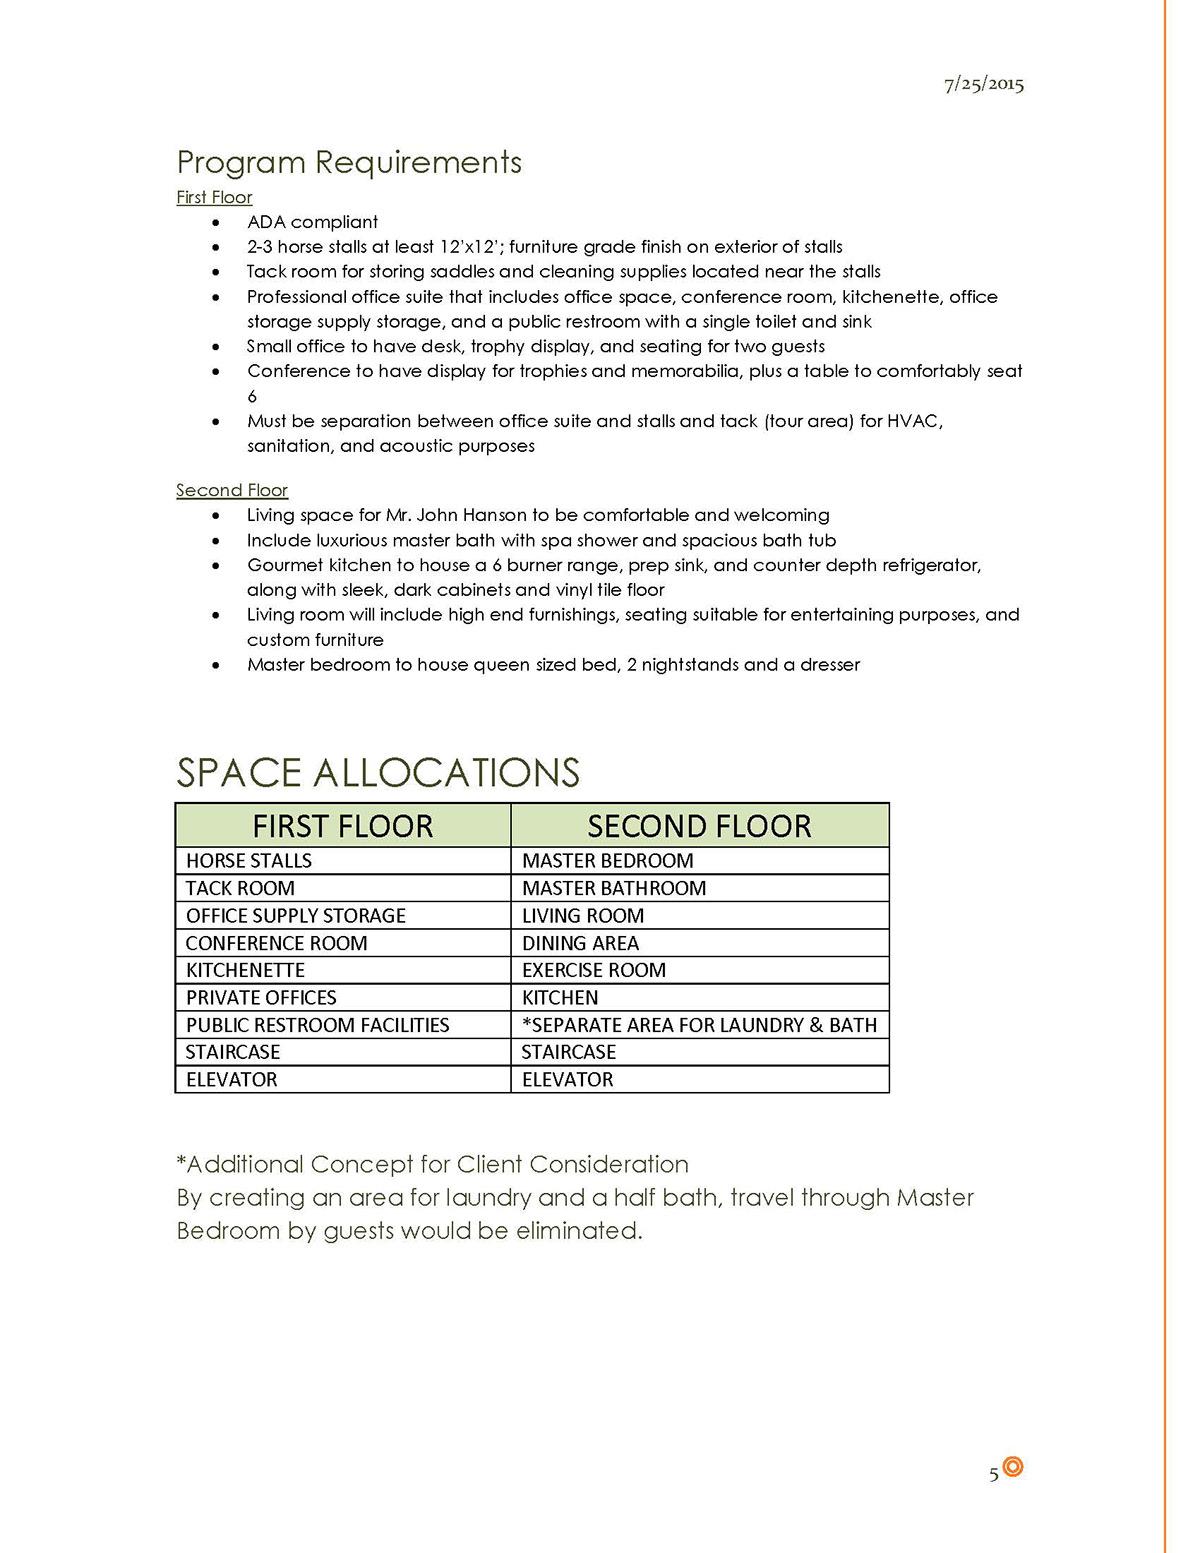 renovation Space Planning interior design